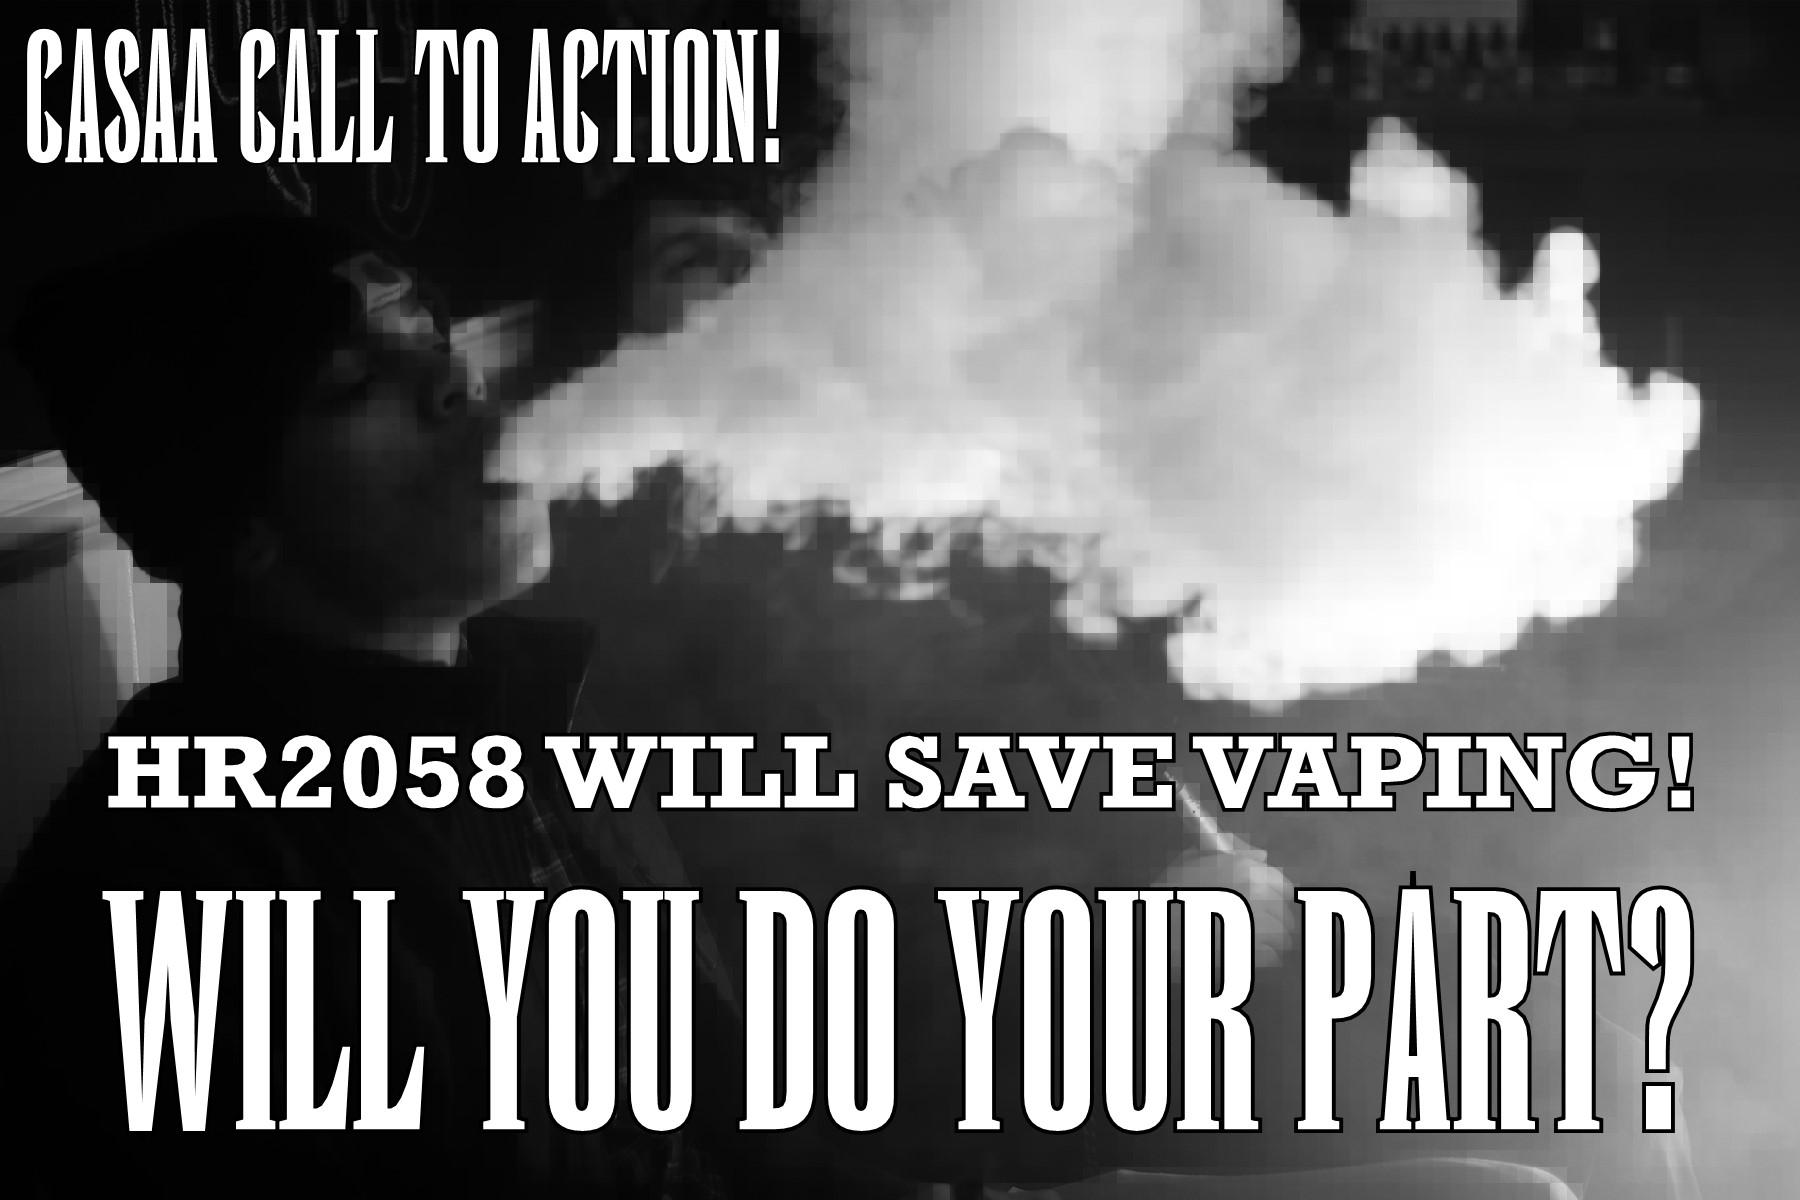 hr2058_call_to_action_vaping_casaa_save_a_vape_downtown_vaporium_clearwater_florida_advocacy.jpg